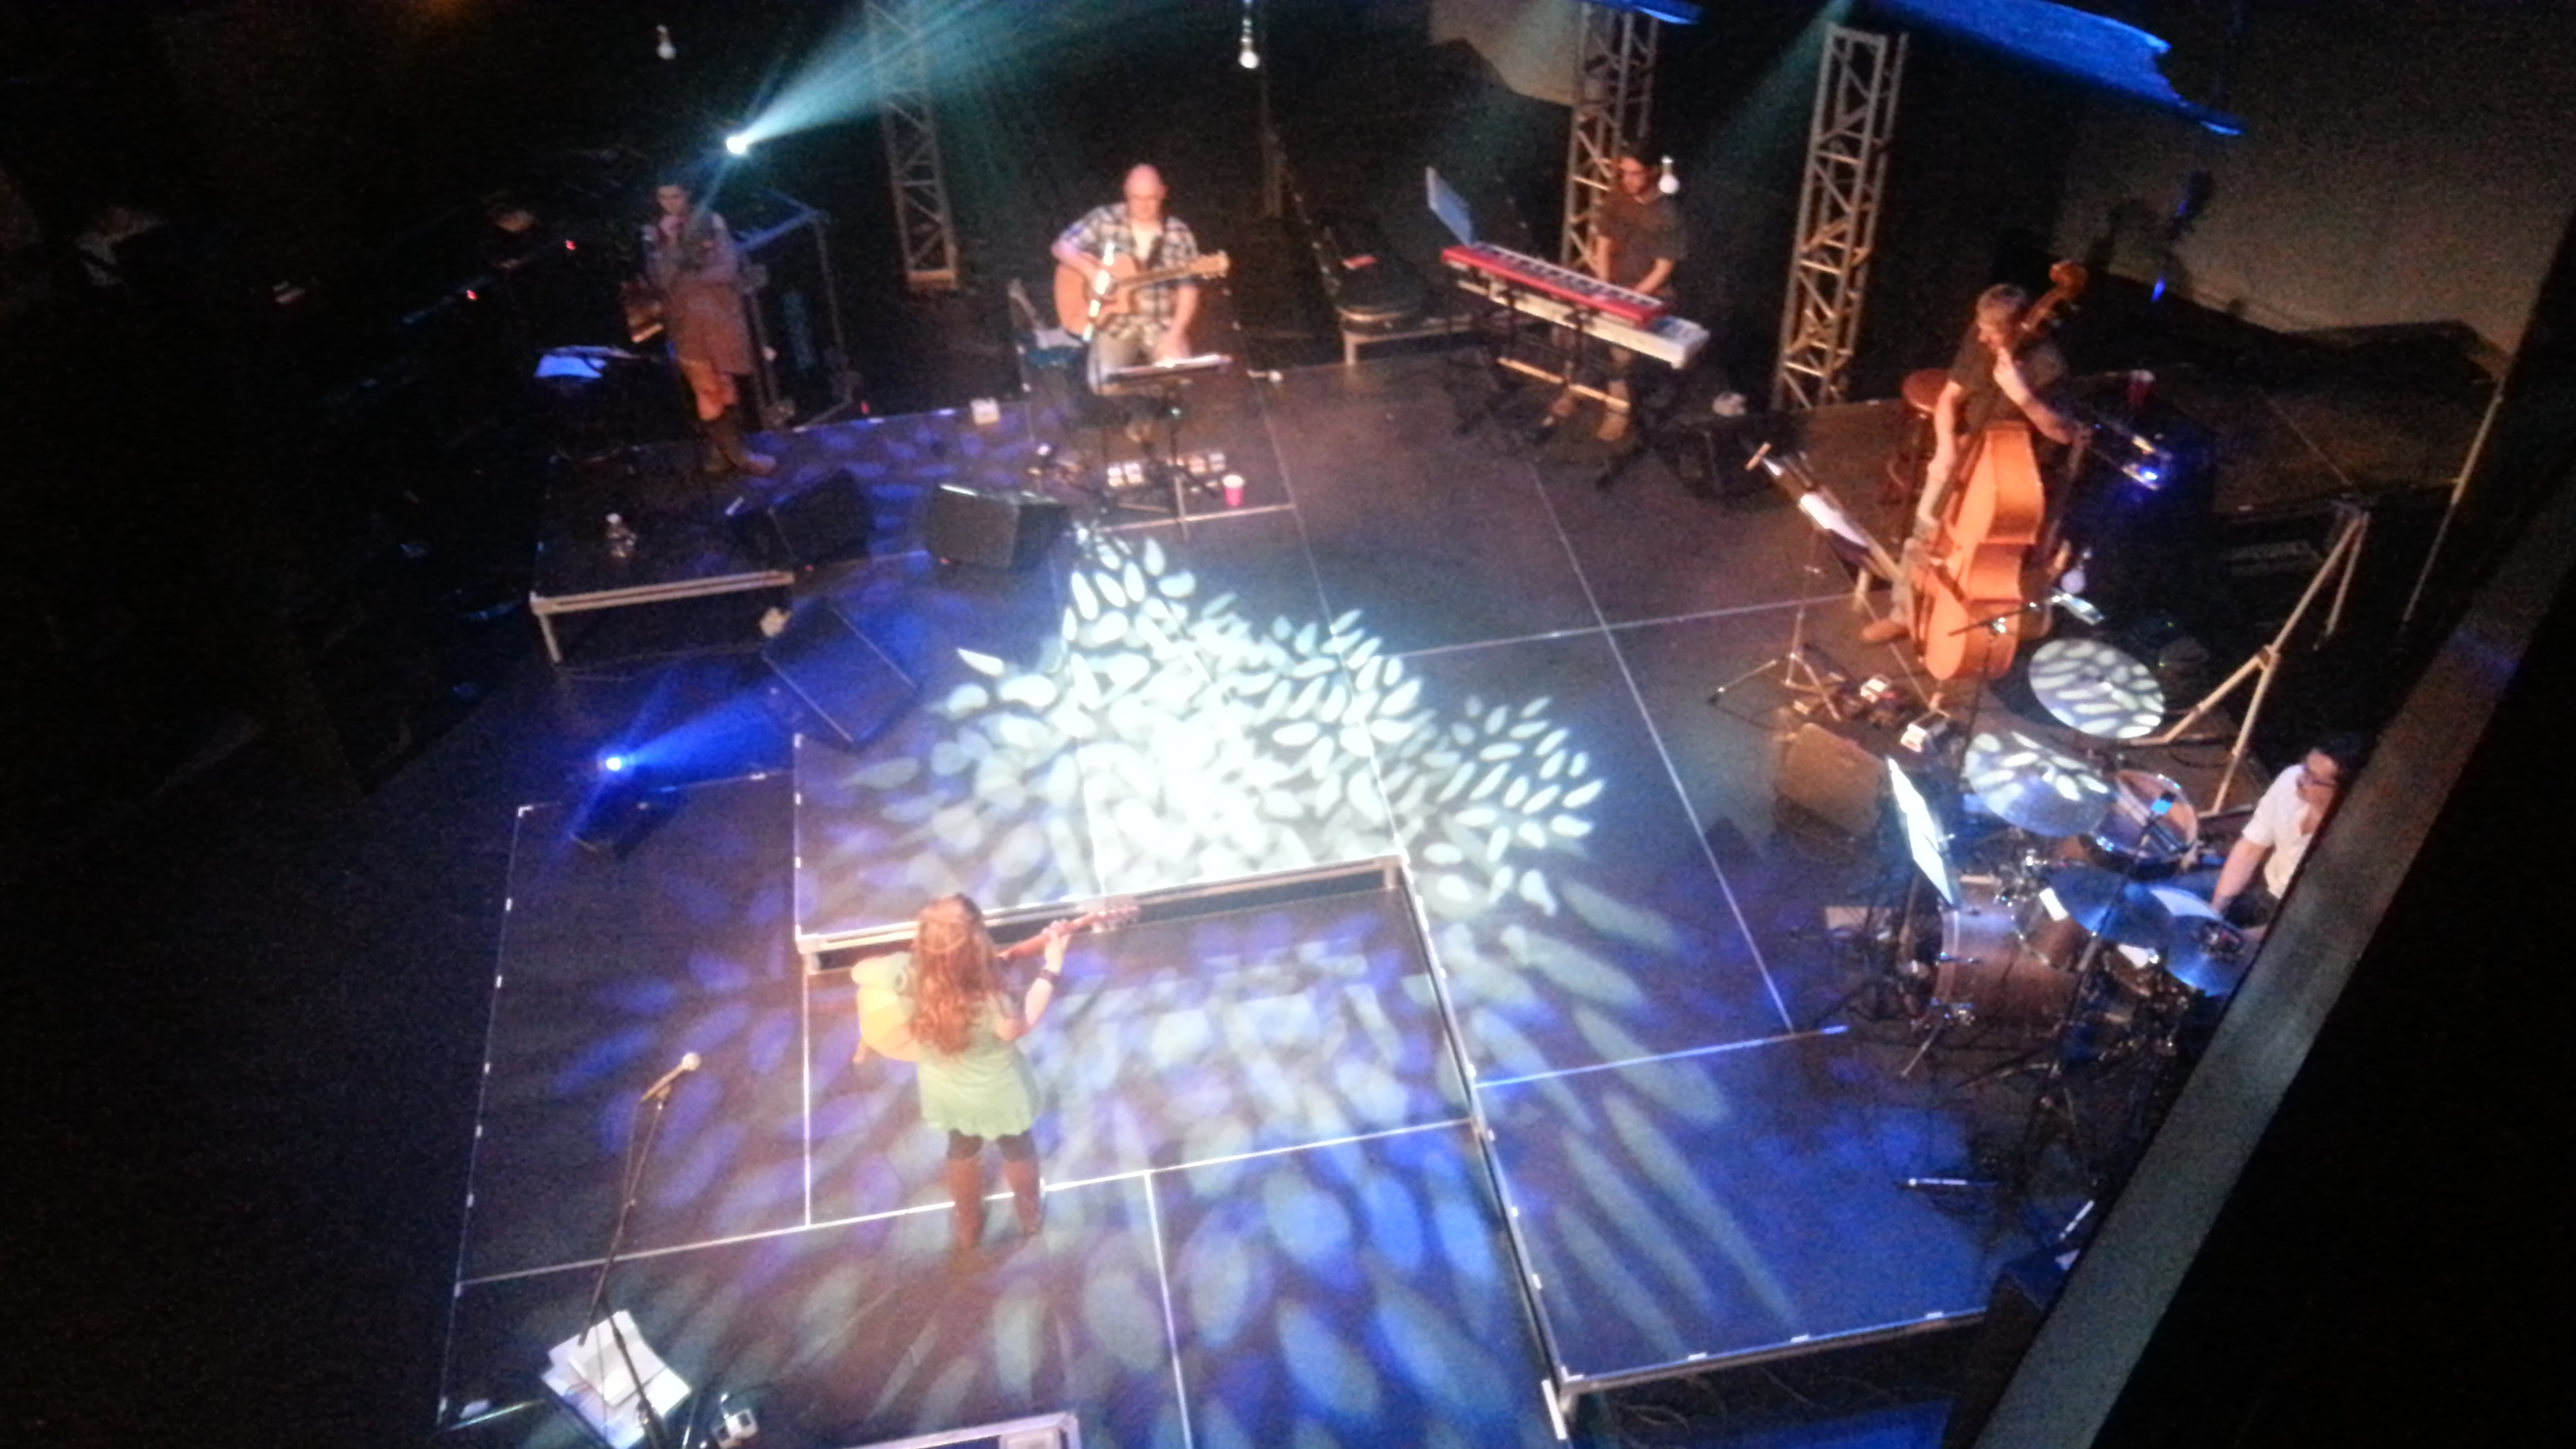 Rehearsal, Chant' Ouest 2014, Edmonton, AB